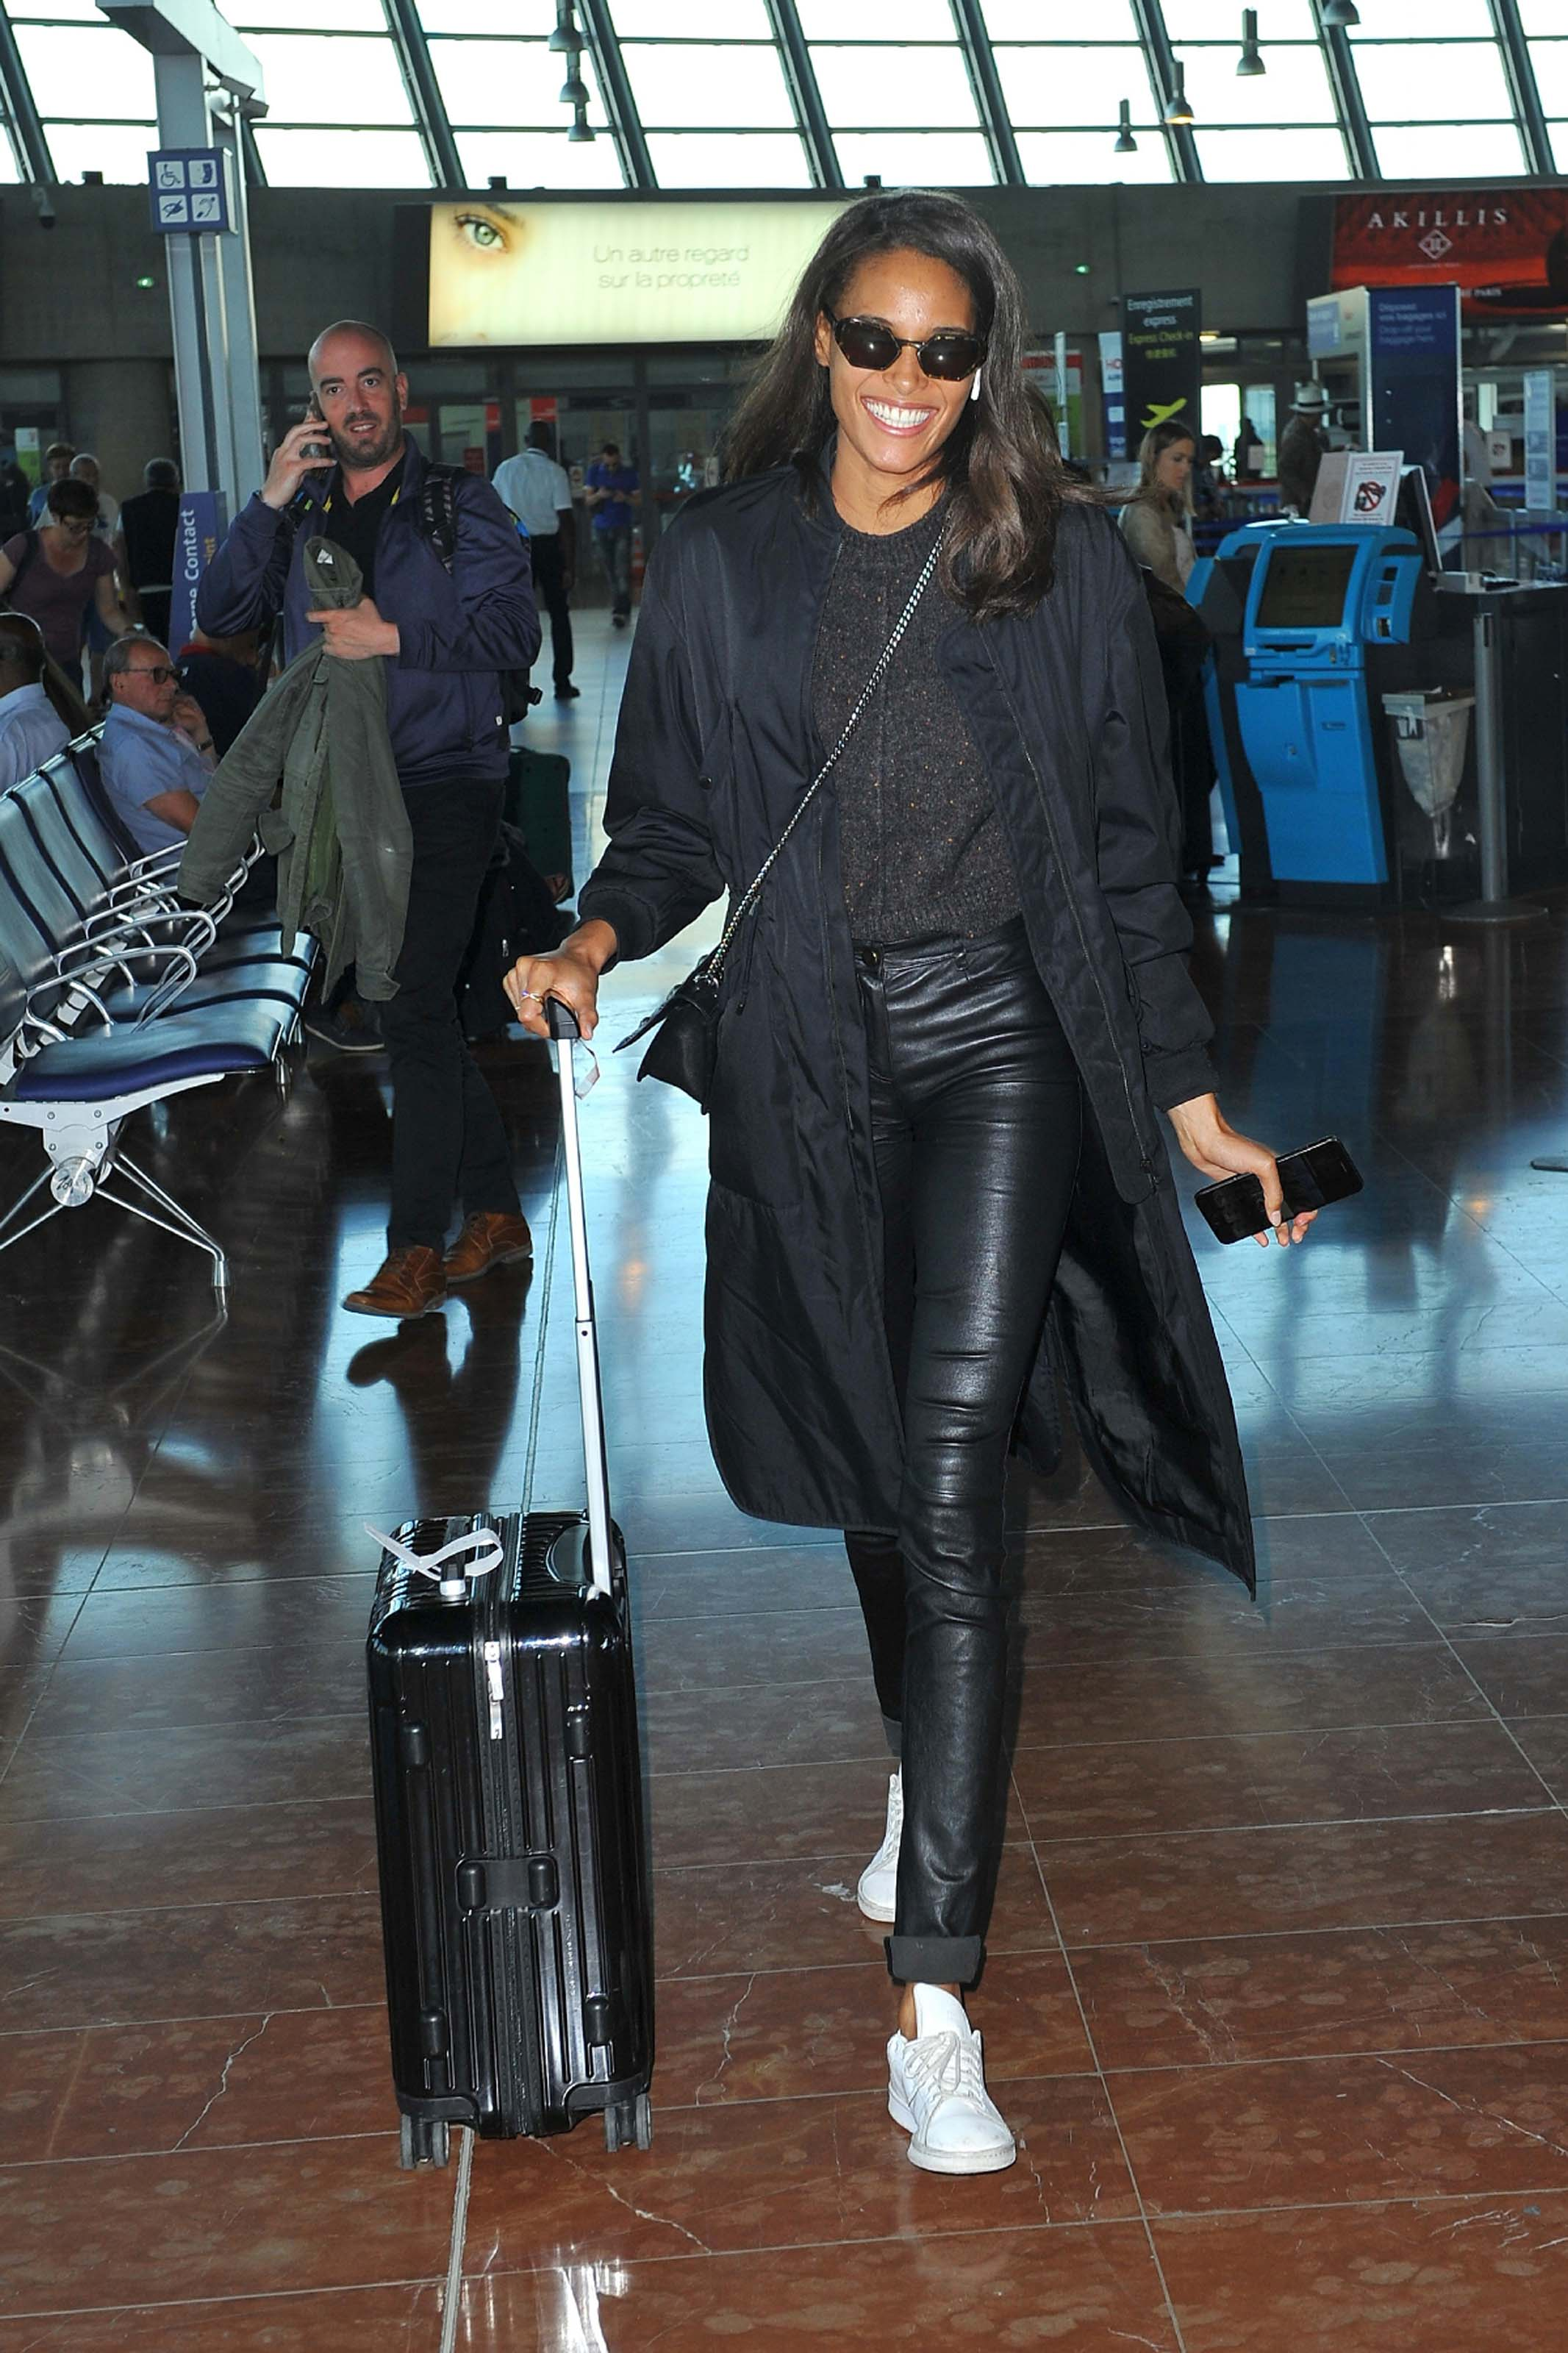 Cindy Bruna at Nice airport